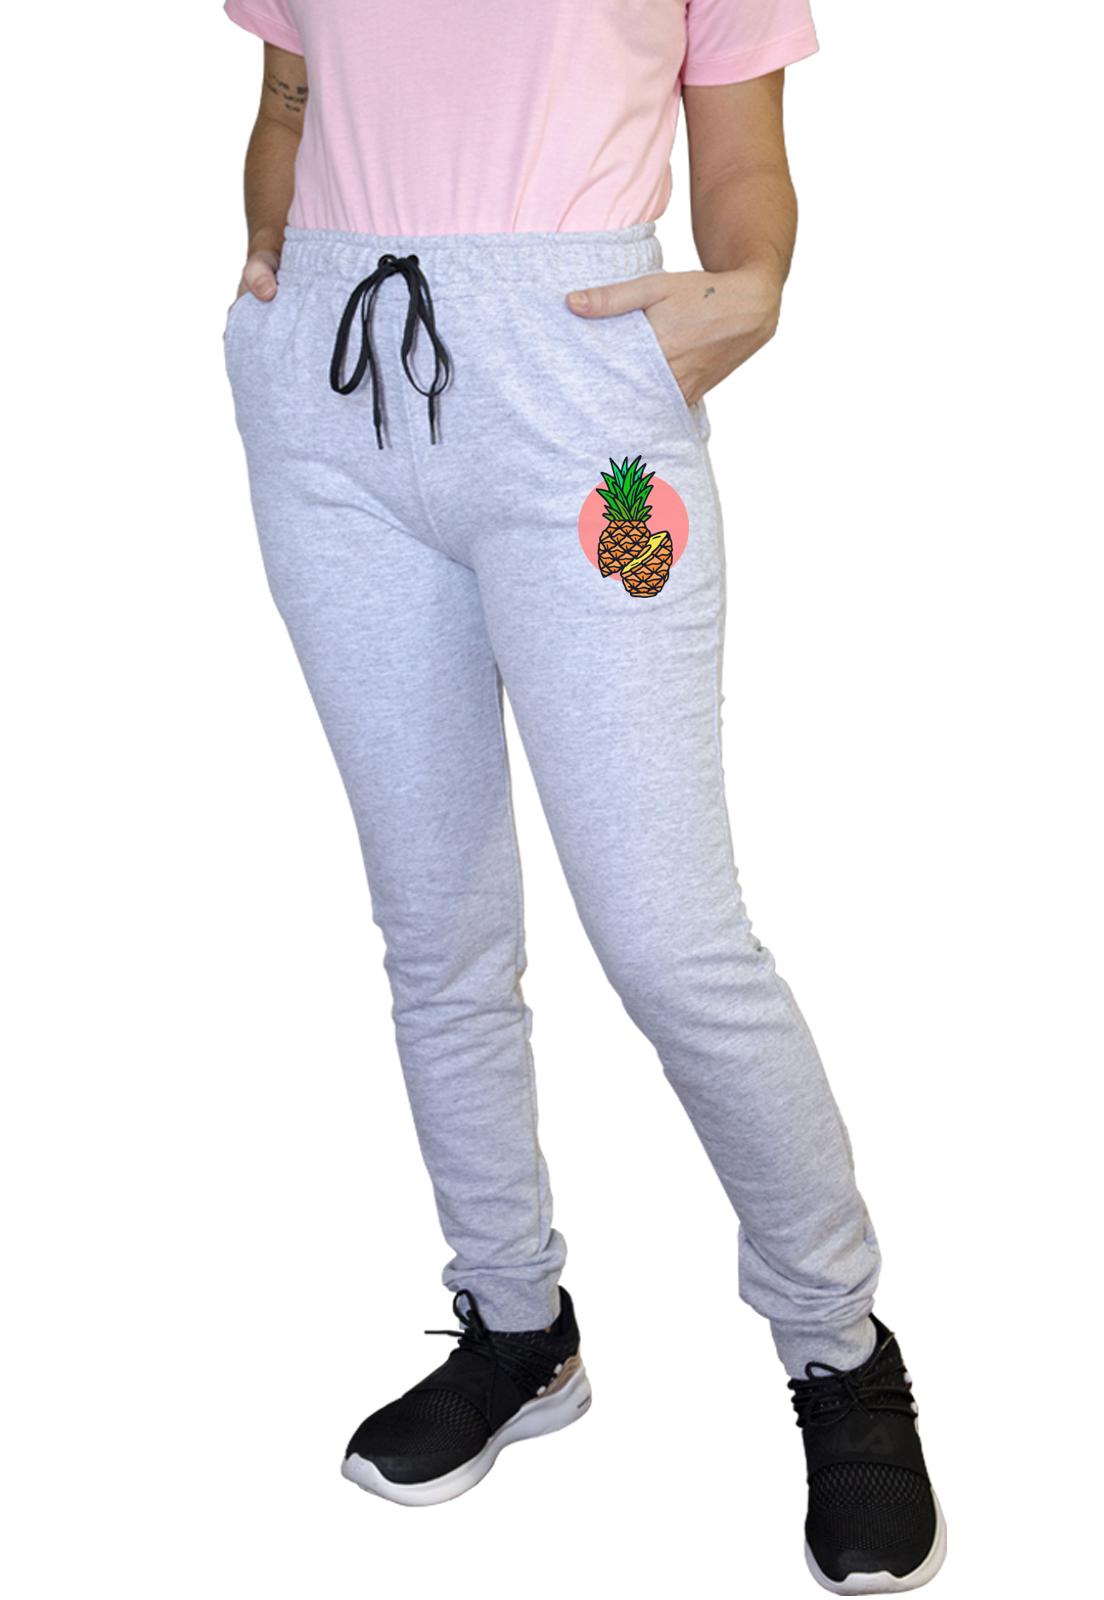 Calça Feminina Jogger Boutique Judith Pineapple